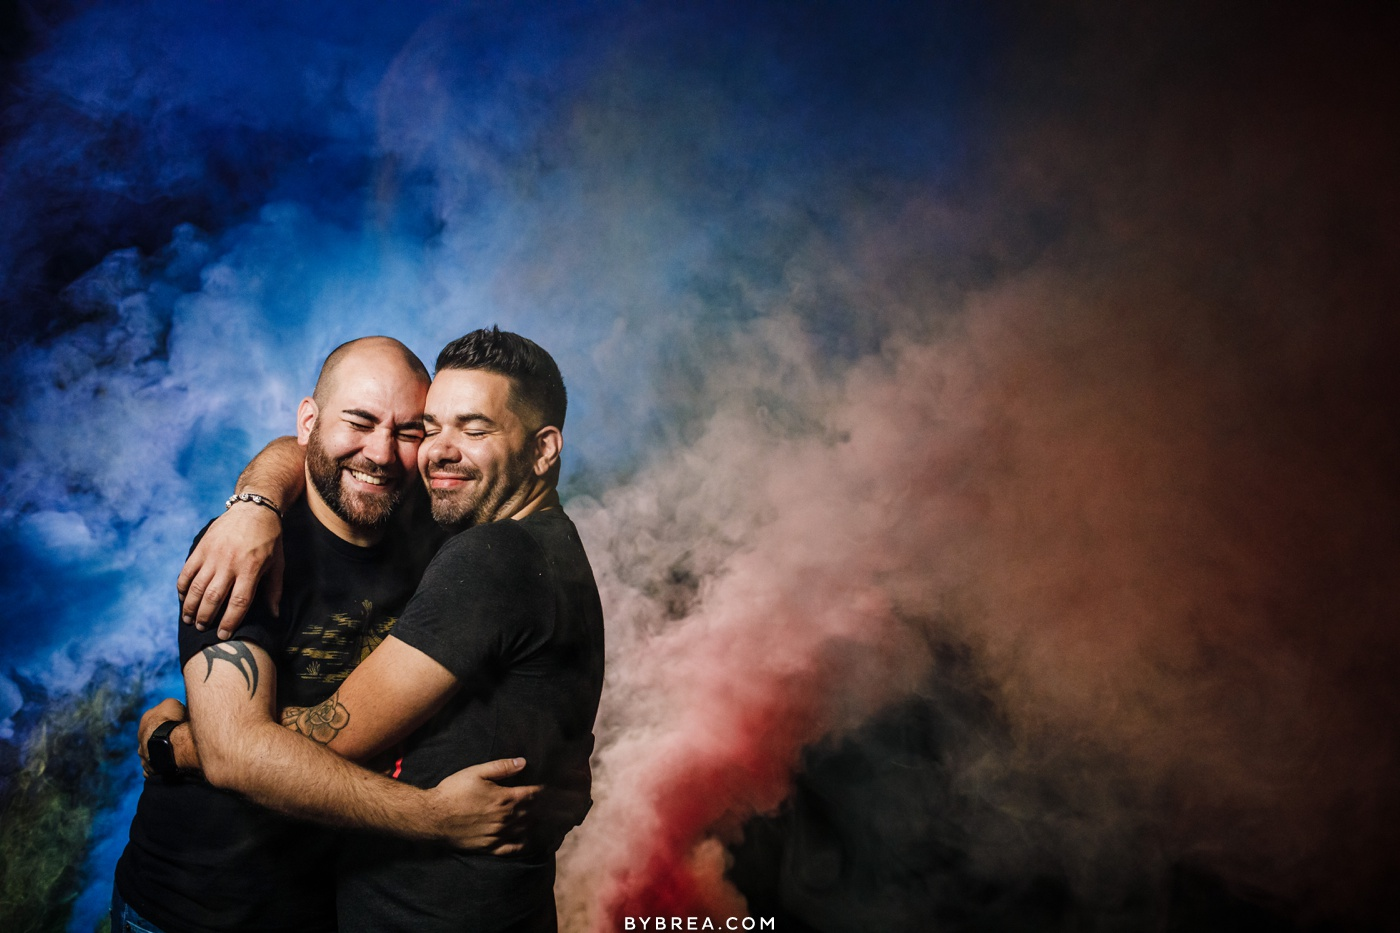 Nighttime smoke bomb photo of same-sex couple Baltimore